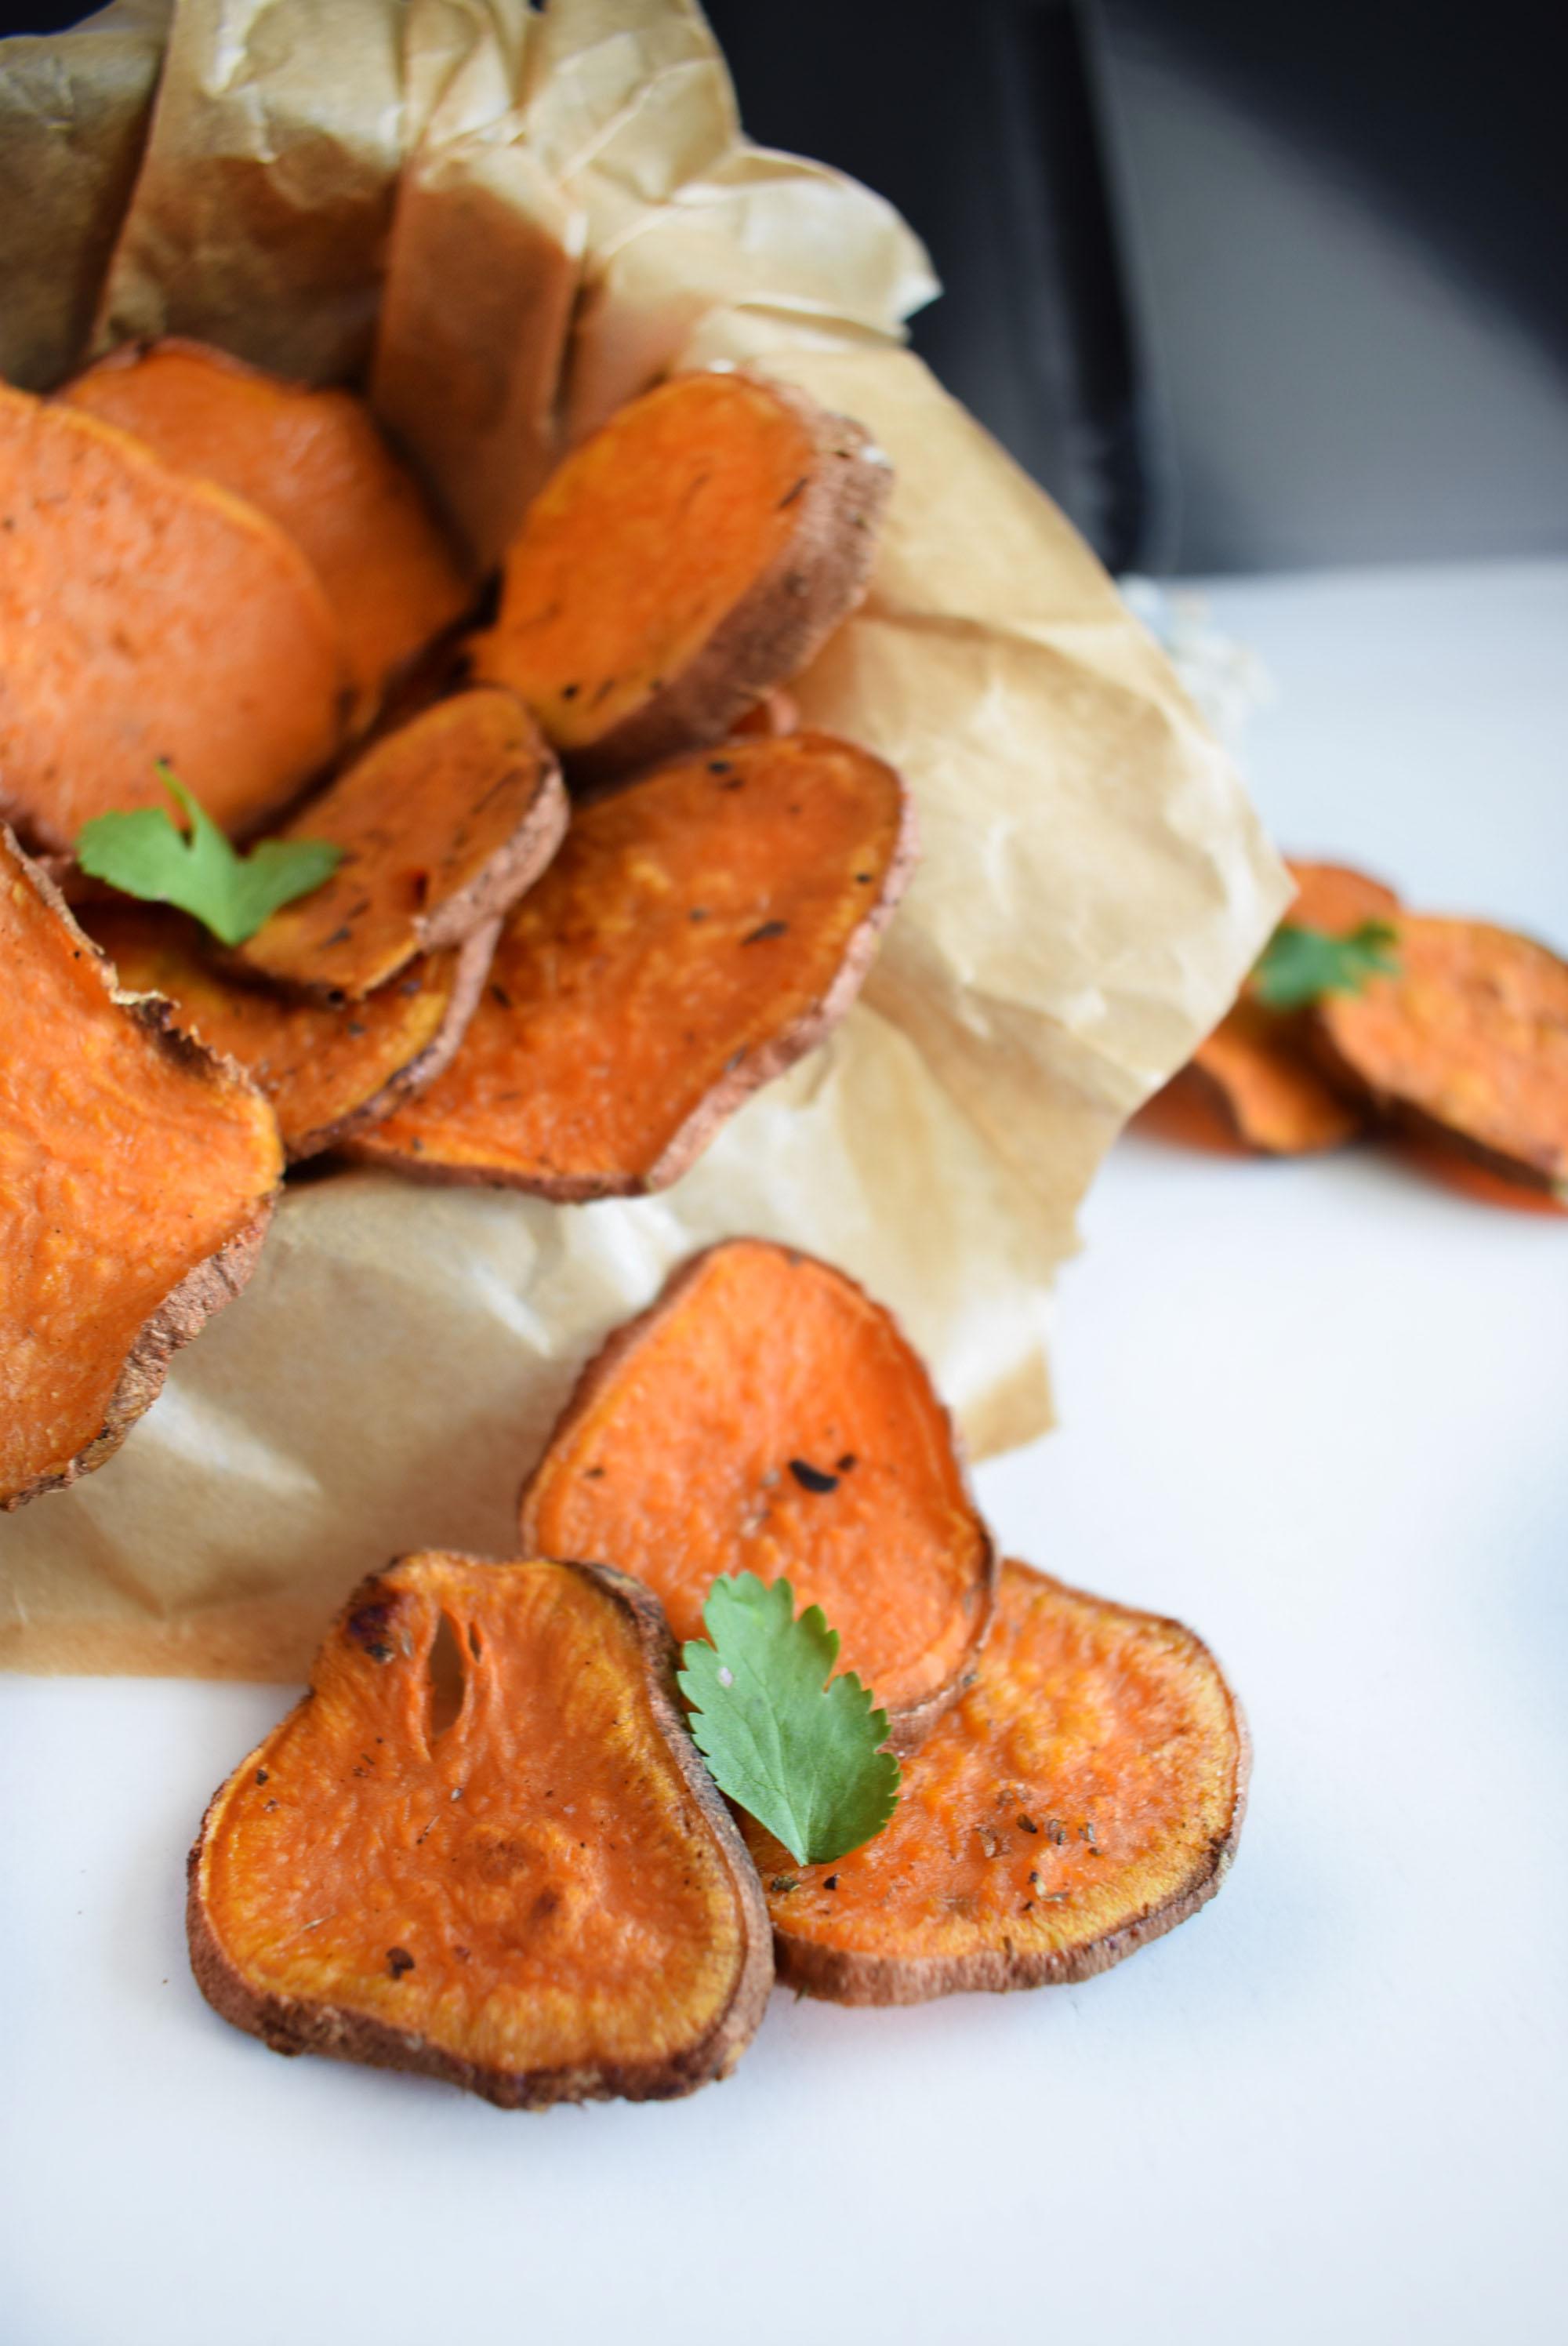 chipsuri din cartofi dulci la cuptor 3 baked sweet potato chips